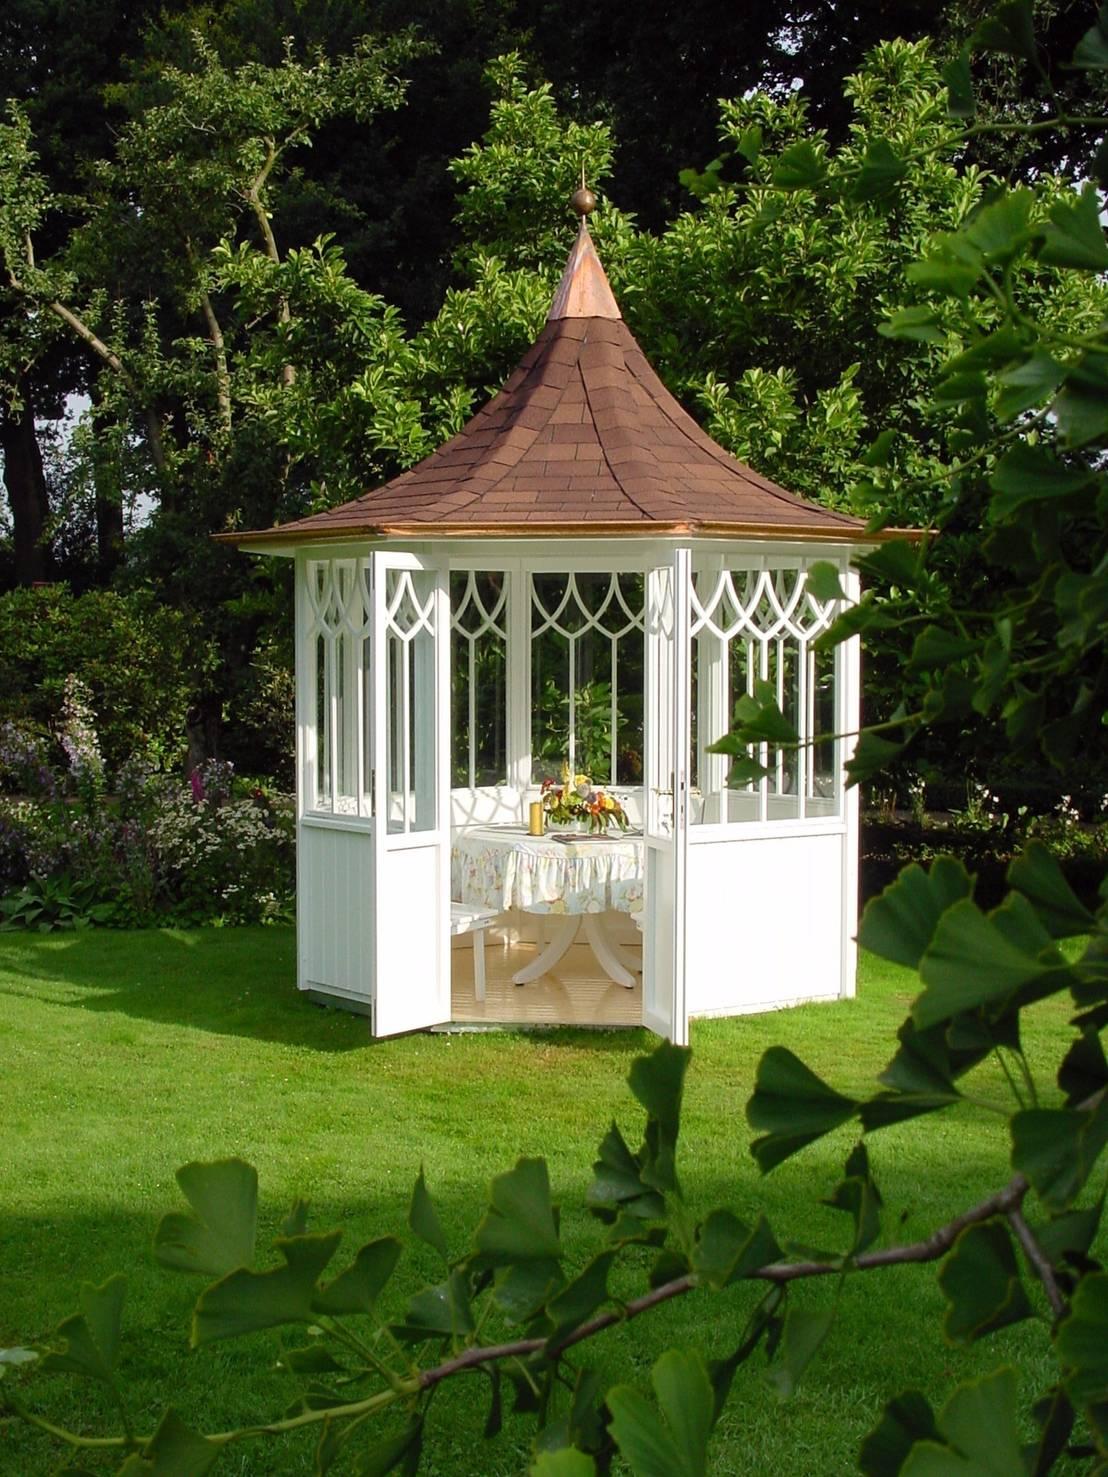 der woga gartenpavillon elegance markant und elegant von woga gartenpavillon homify. Black Bedroom Furniture Sets. Home Design Ideas